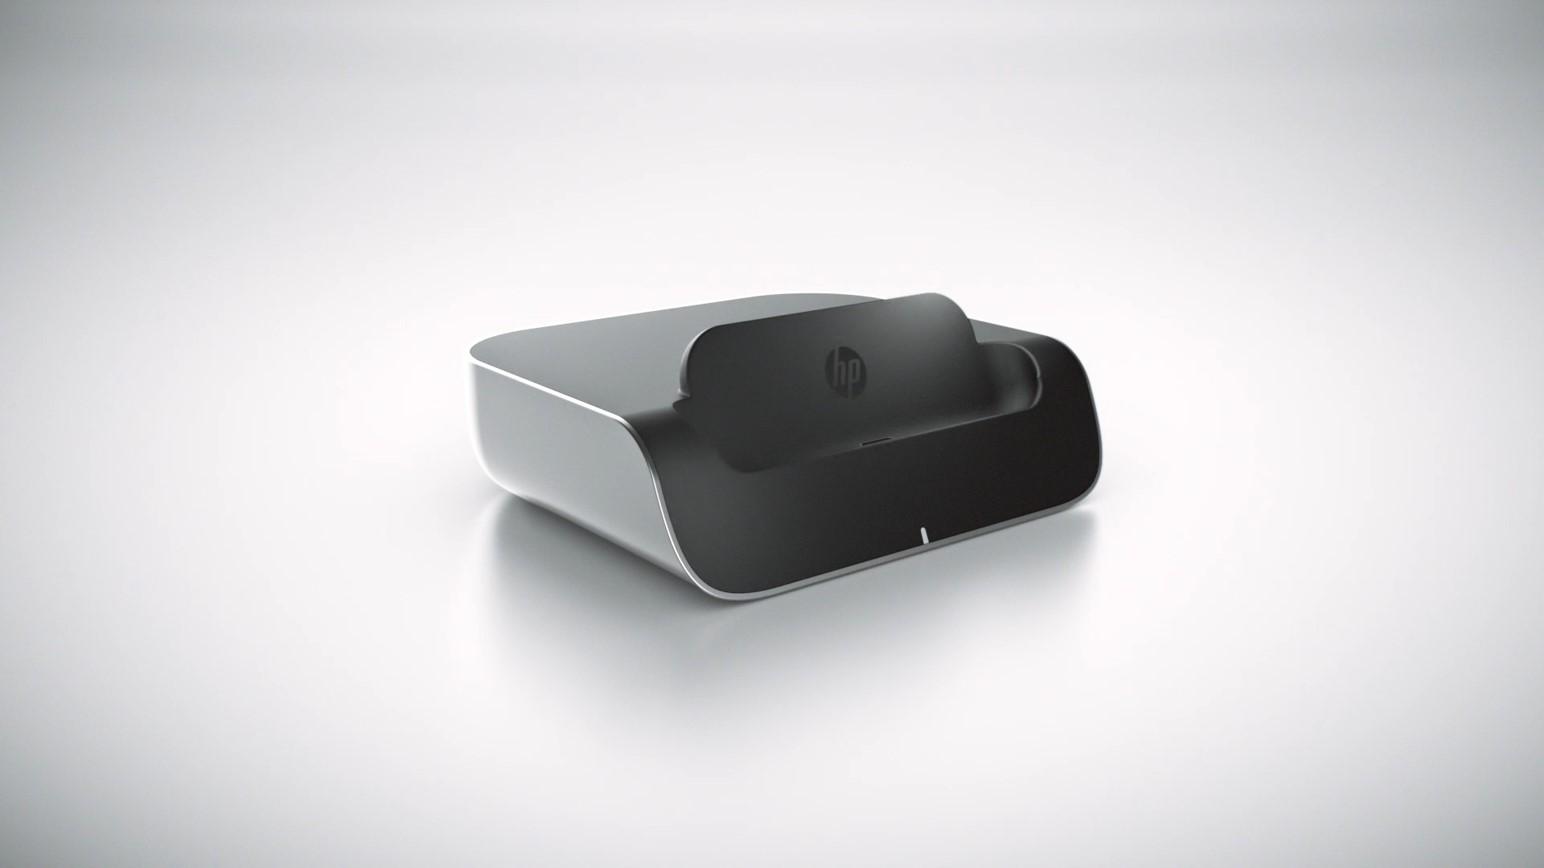 Hp Elite X3 Desk Dock Mwc 2016 Hp Unveils The Elite X3 A